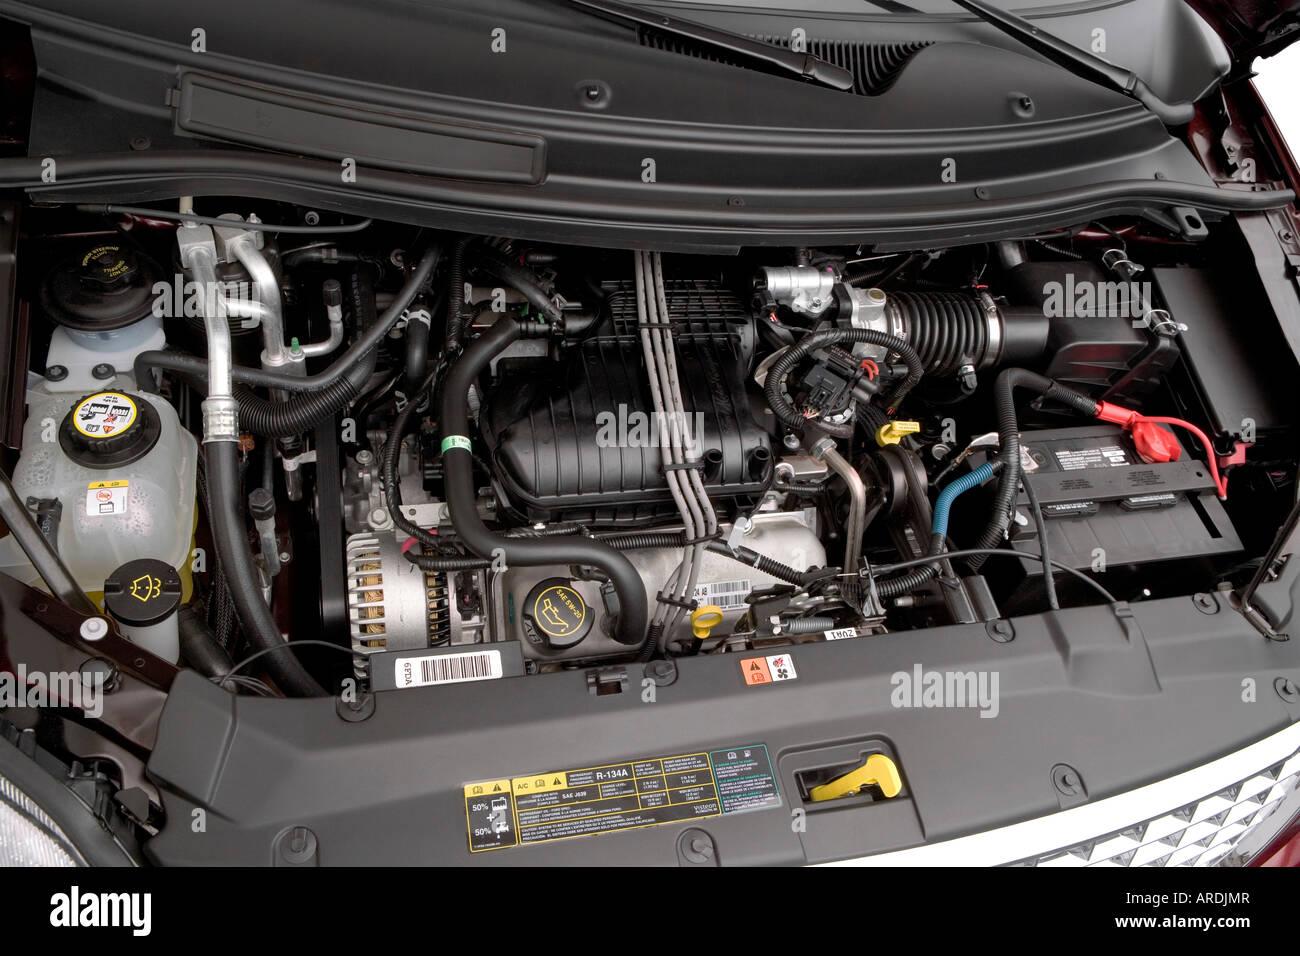 500 sel w126 engine f wallpaper 2048x1536 332128 wallpaperup - 500 Sel W126 Engine F Wallpaper 2048x1536 332128 Wallpaperup 500 Sel W126 Engine F Wallpaper